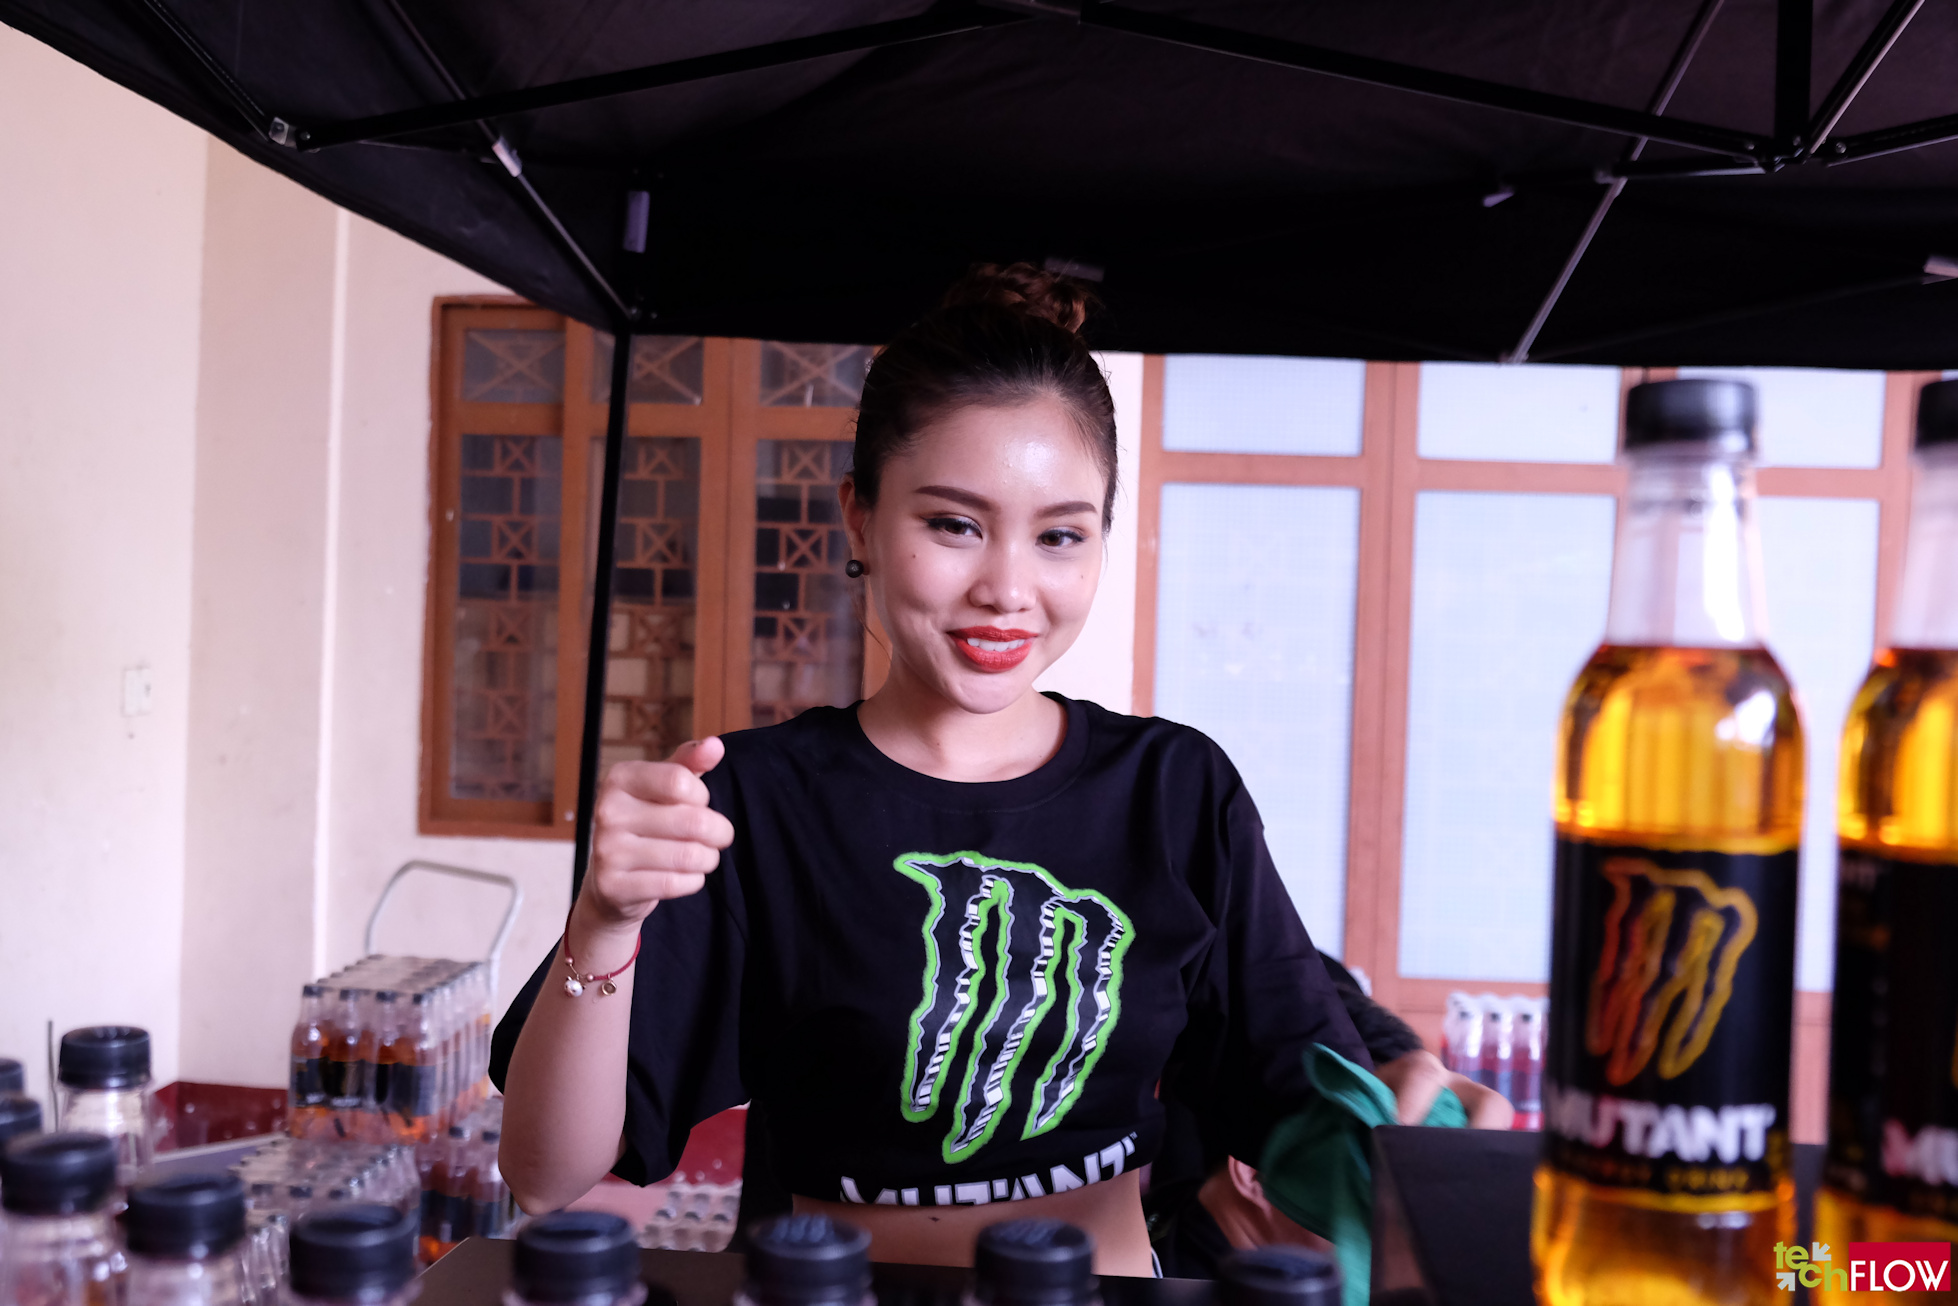 Su-Kien-Dau-Truong-May-Tinh-Mua5-136